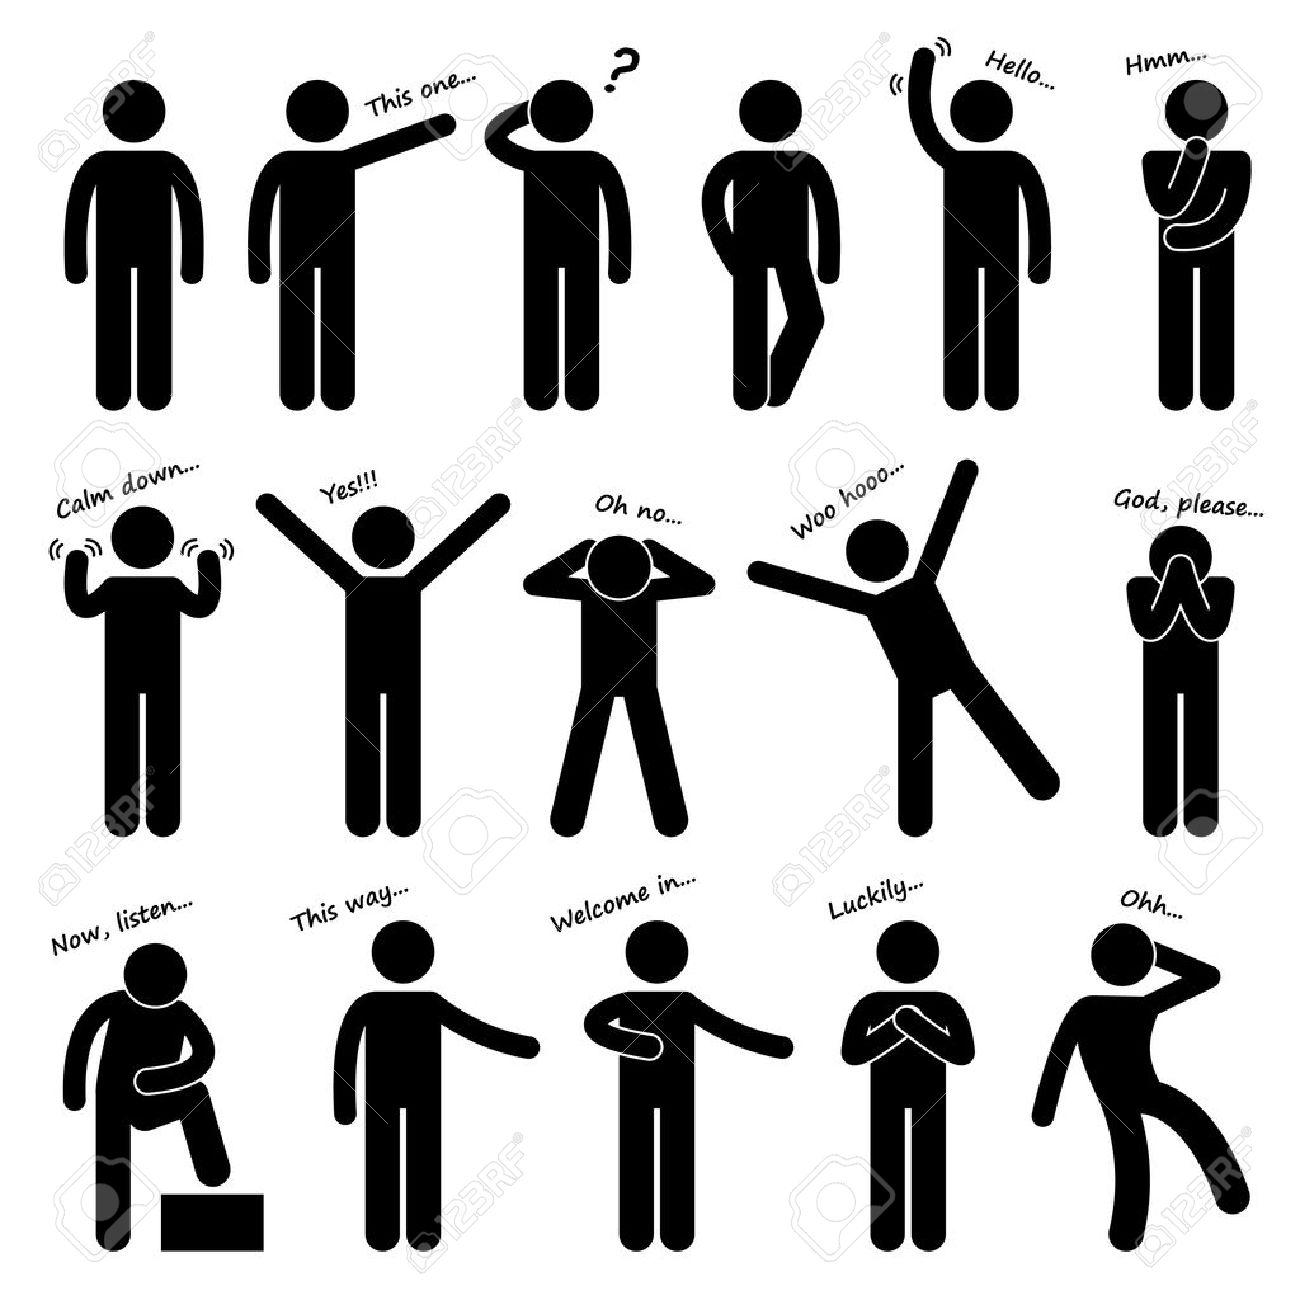 Man People Person Basic Body Language Posture Stick Figure Pictogram Icon - 18911138